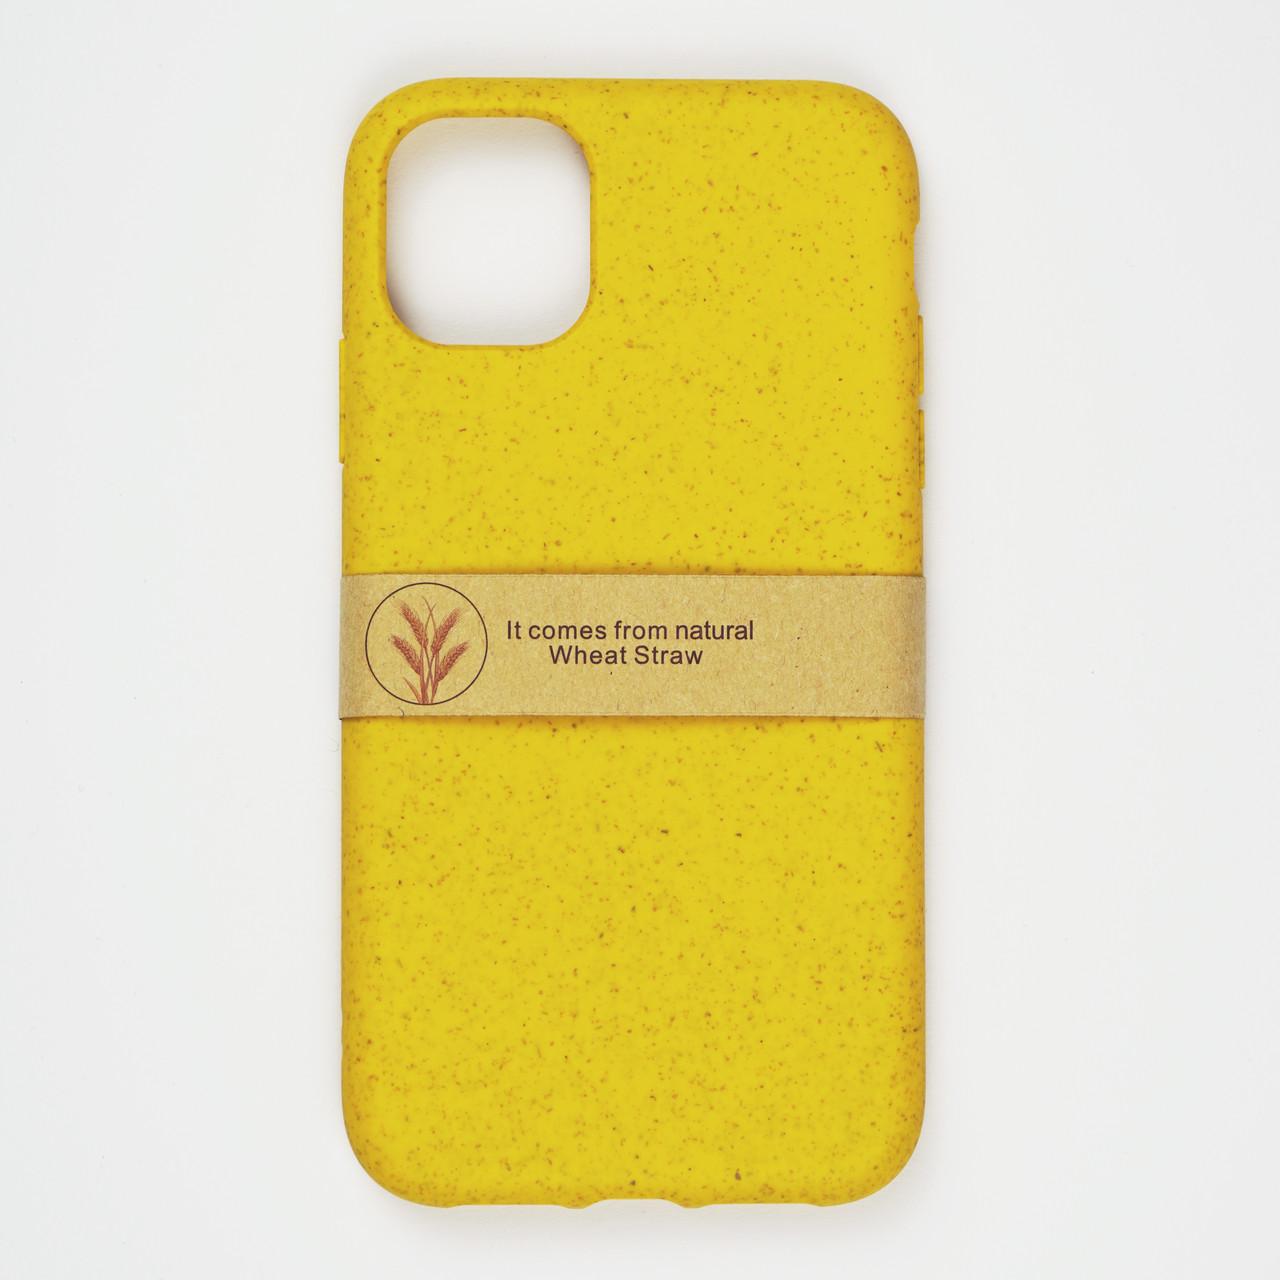 Биоразлагаемый чехол ECO Wheat Straw для iPhone 11 Pro Yellow